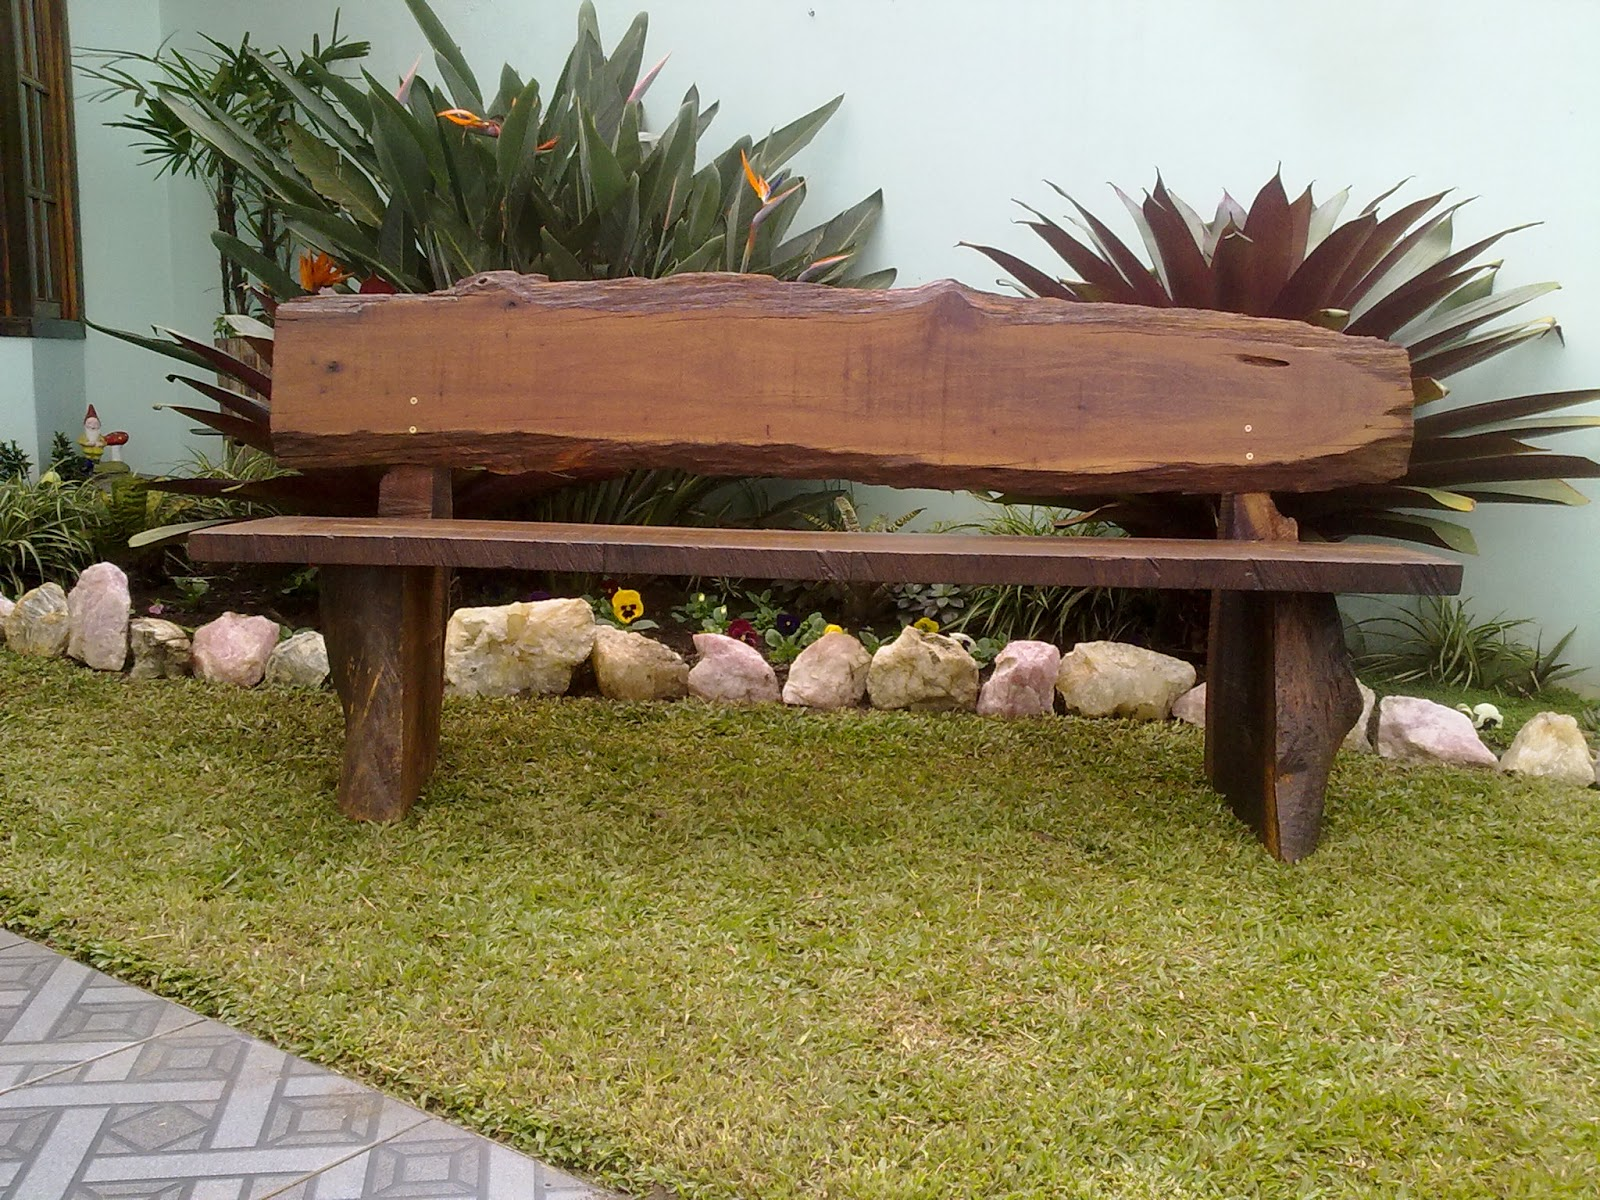 banco de jardim em pvc : banco de jardim em pvc: Cachepots – Marcenaria Artesanal: Bancos para jardim em Imbuia